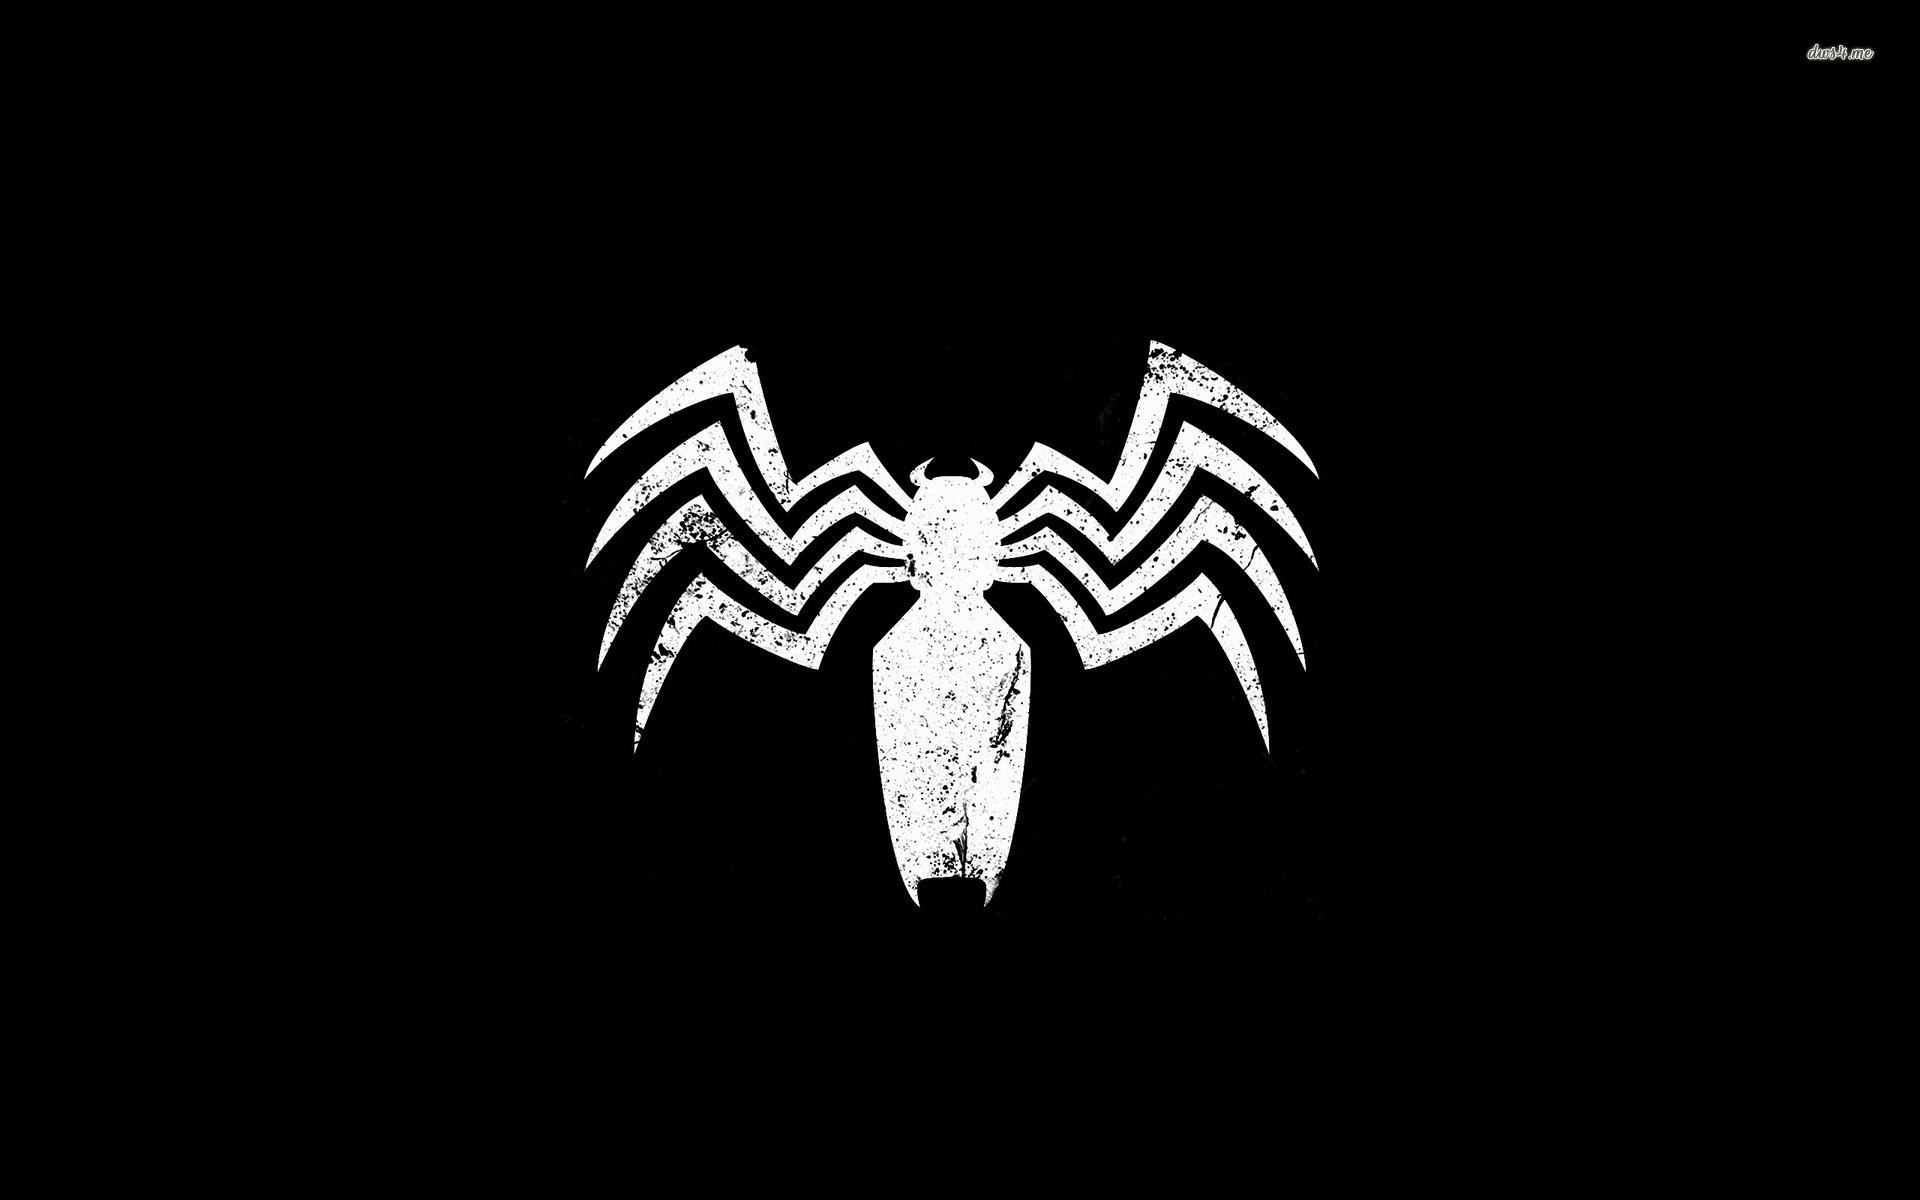 Res: 1920x1200, VPK.677 Venom Spiderman Wallpapers, Gianna Nevius